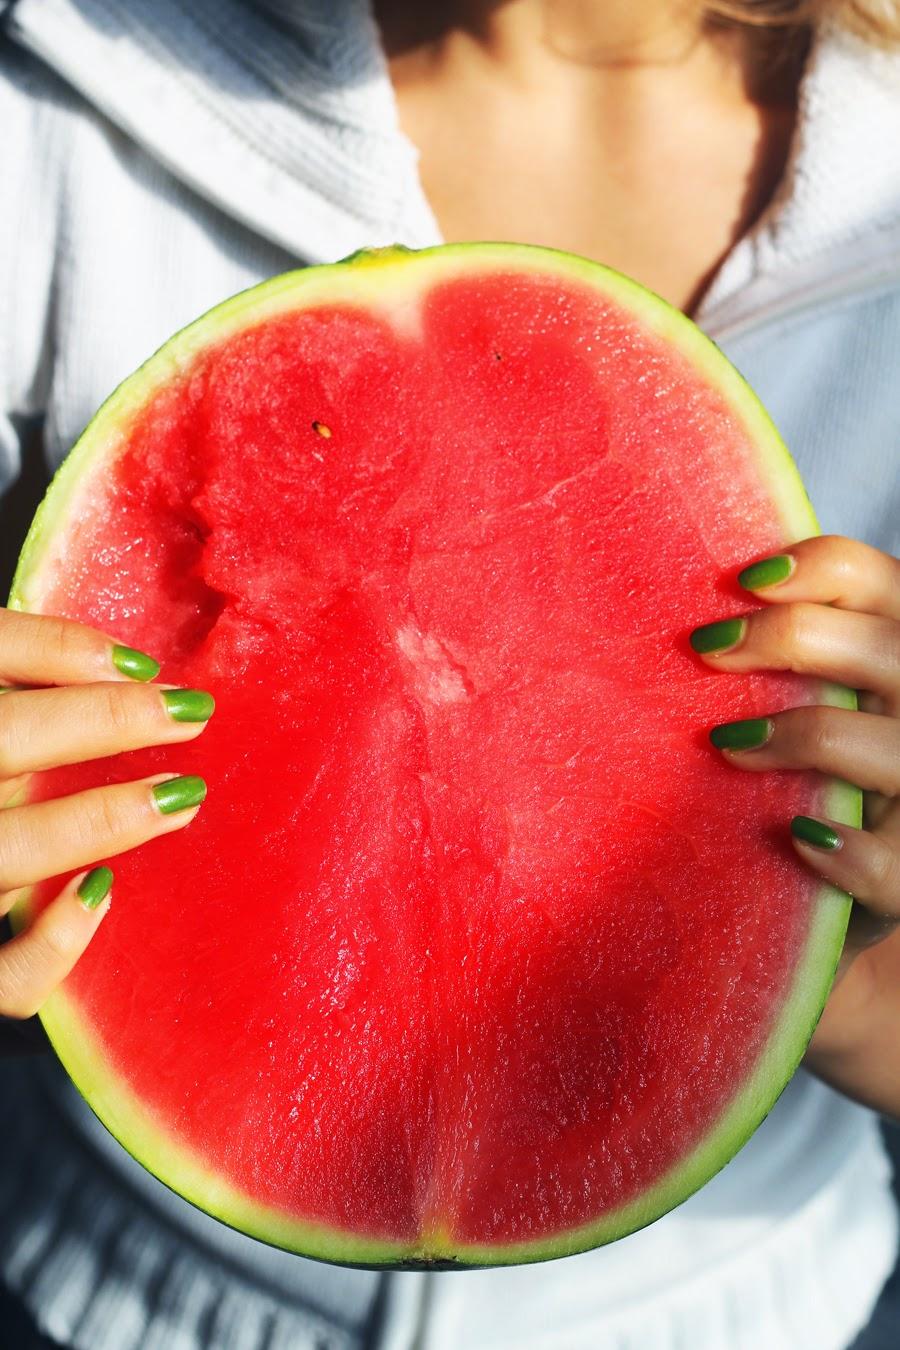 myberlinfashion ernährung wassermelone detox watermelon island